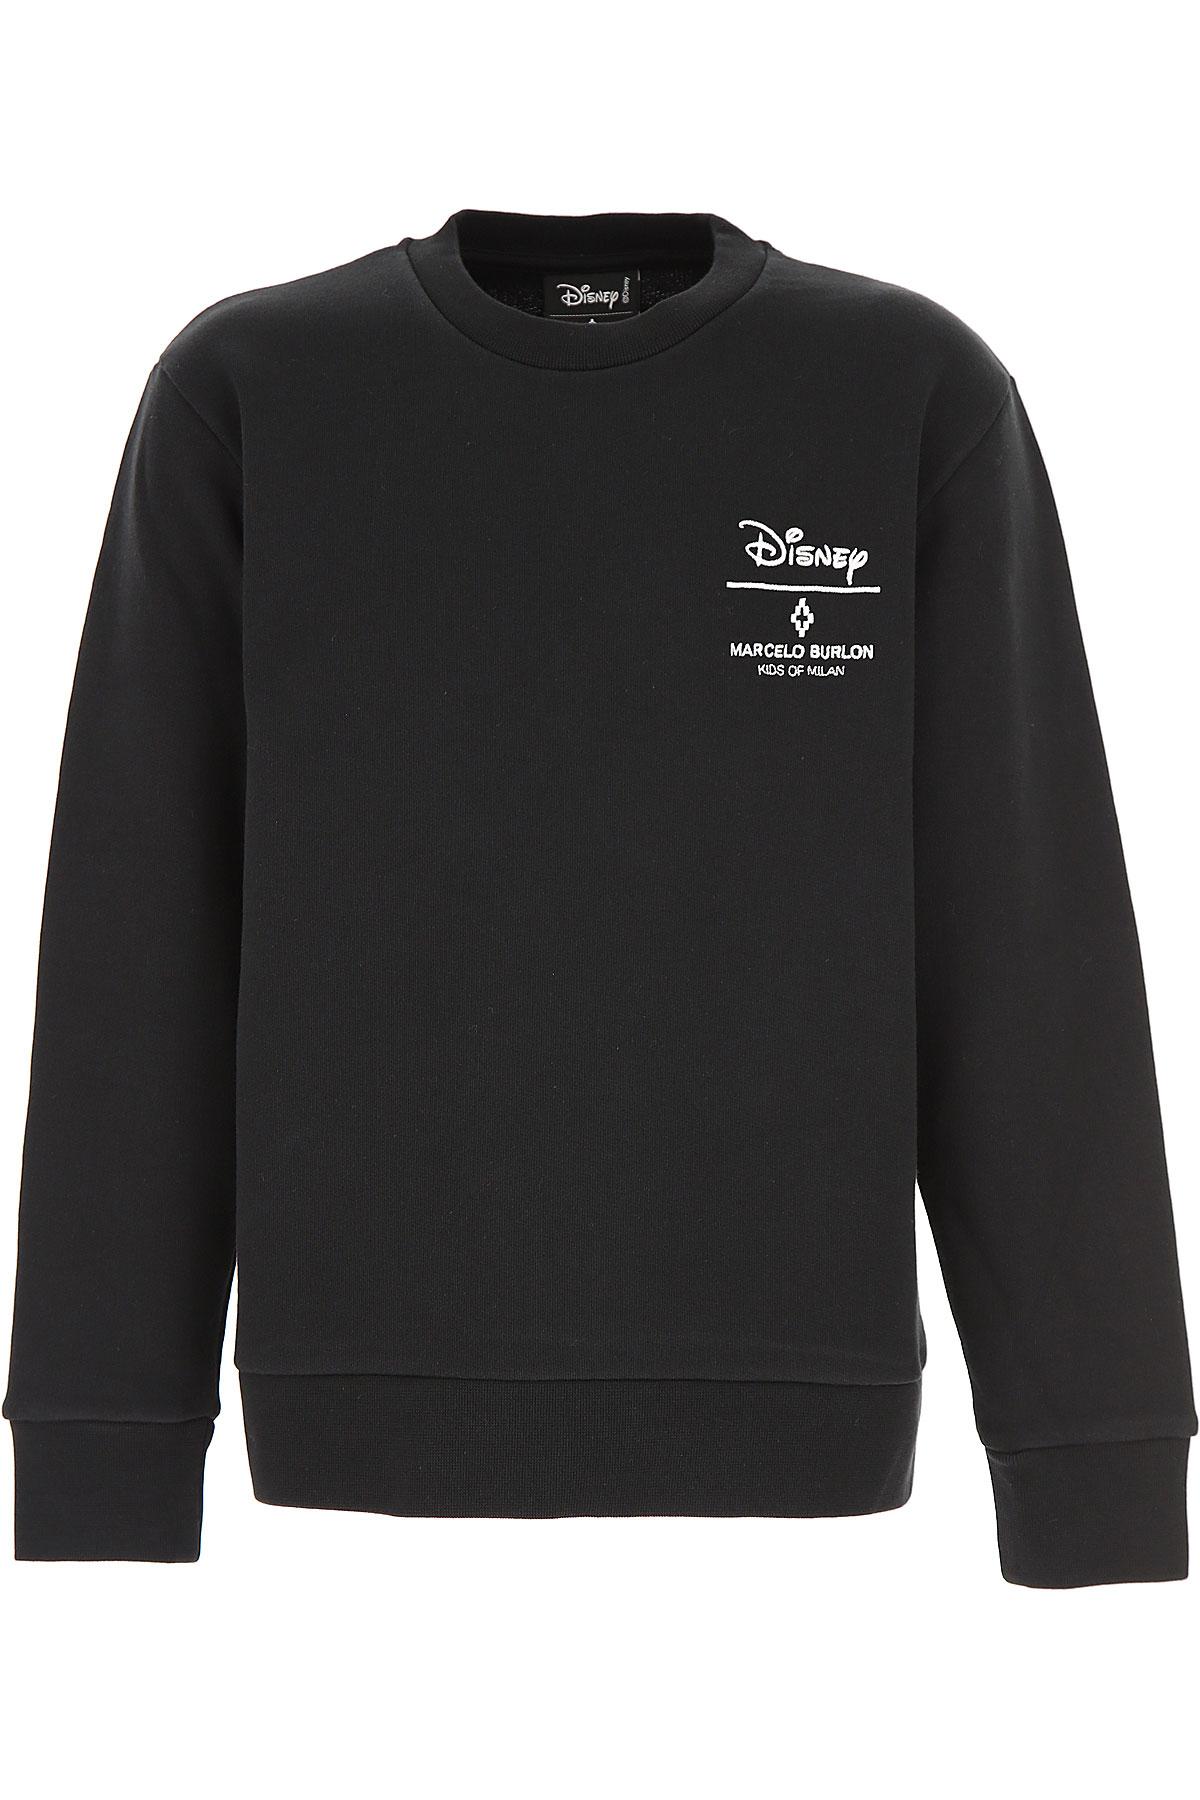 Marcelo Burlon Kids Sweatshirts & Hoodies for Boys On Sale in Outlet, Black, Cotton, 2019, 6Y 8Y